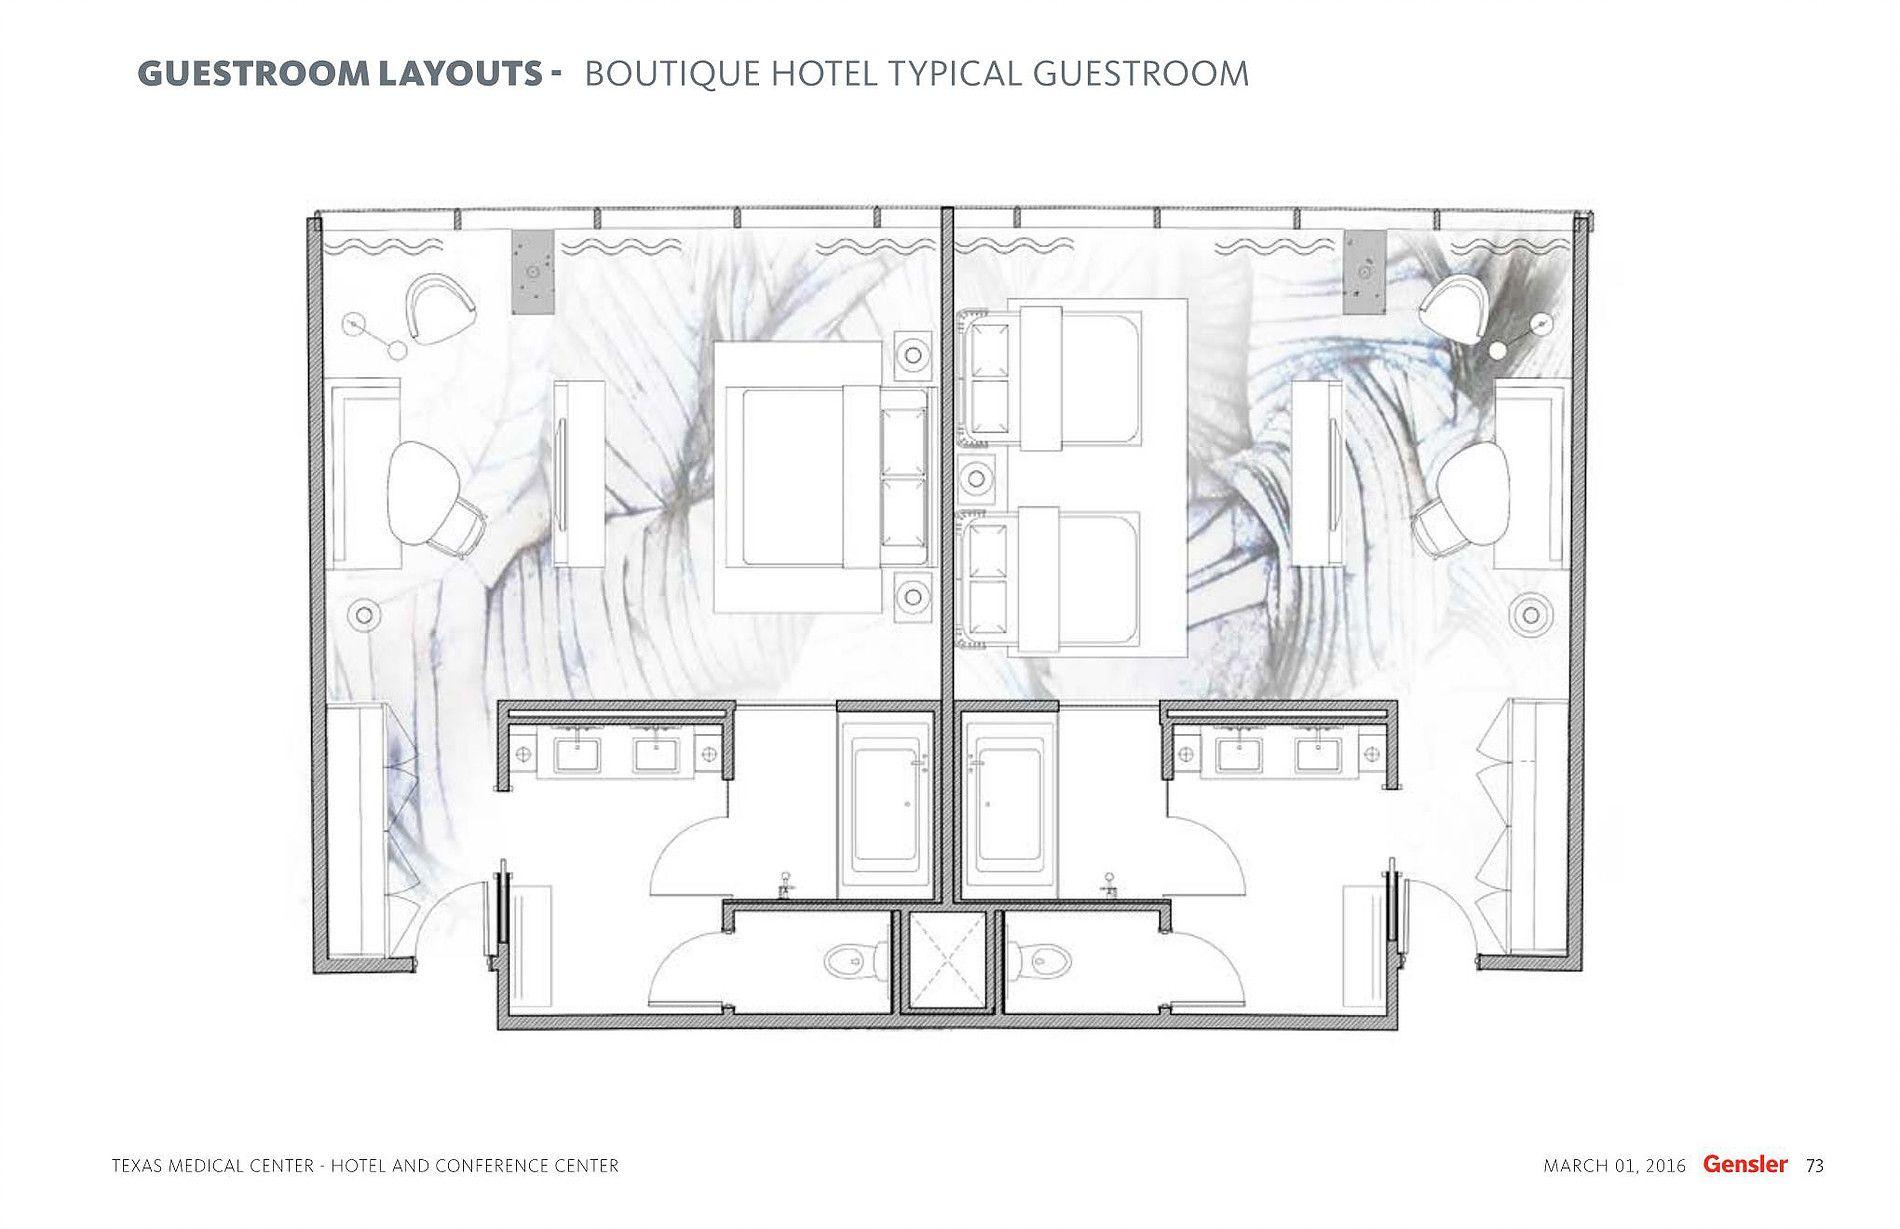 Tmc Hotel Typical Guestroom Plan Hotel House Plans Floor Plans